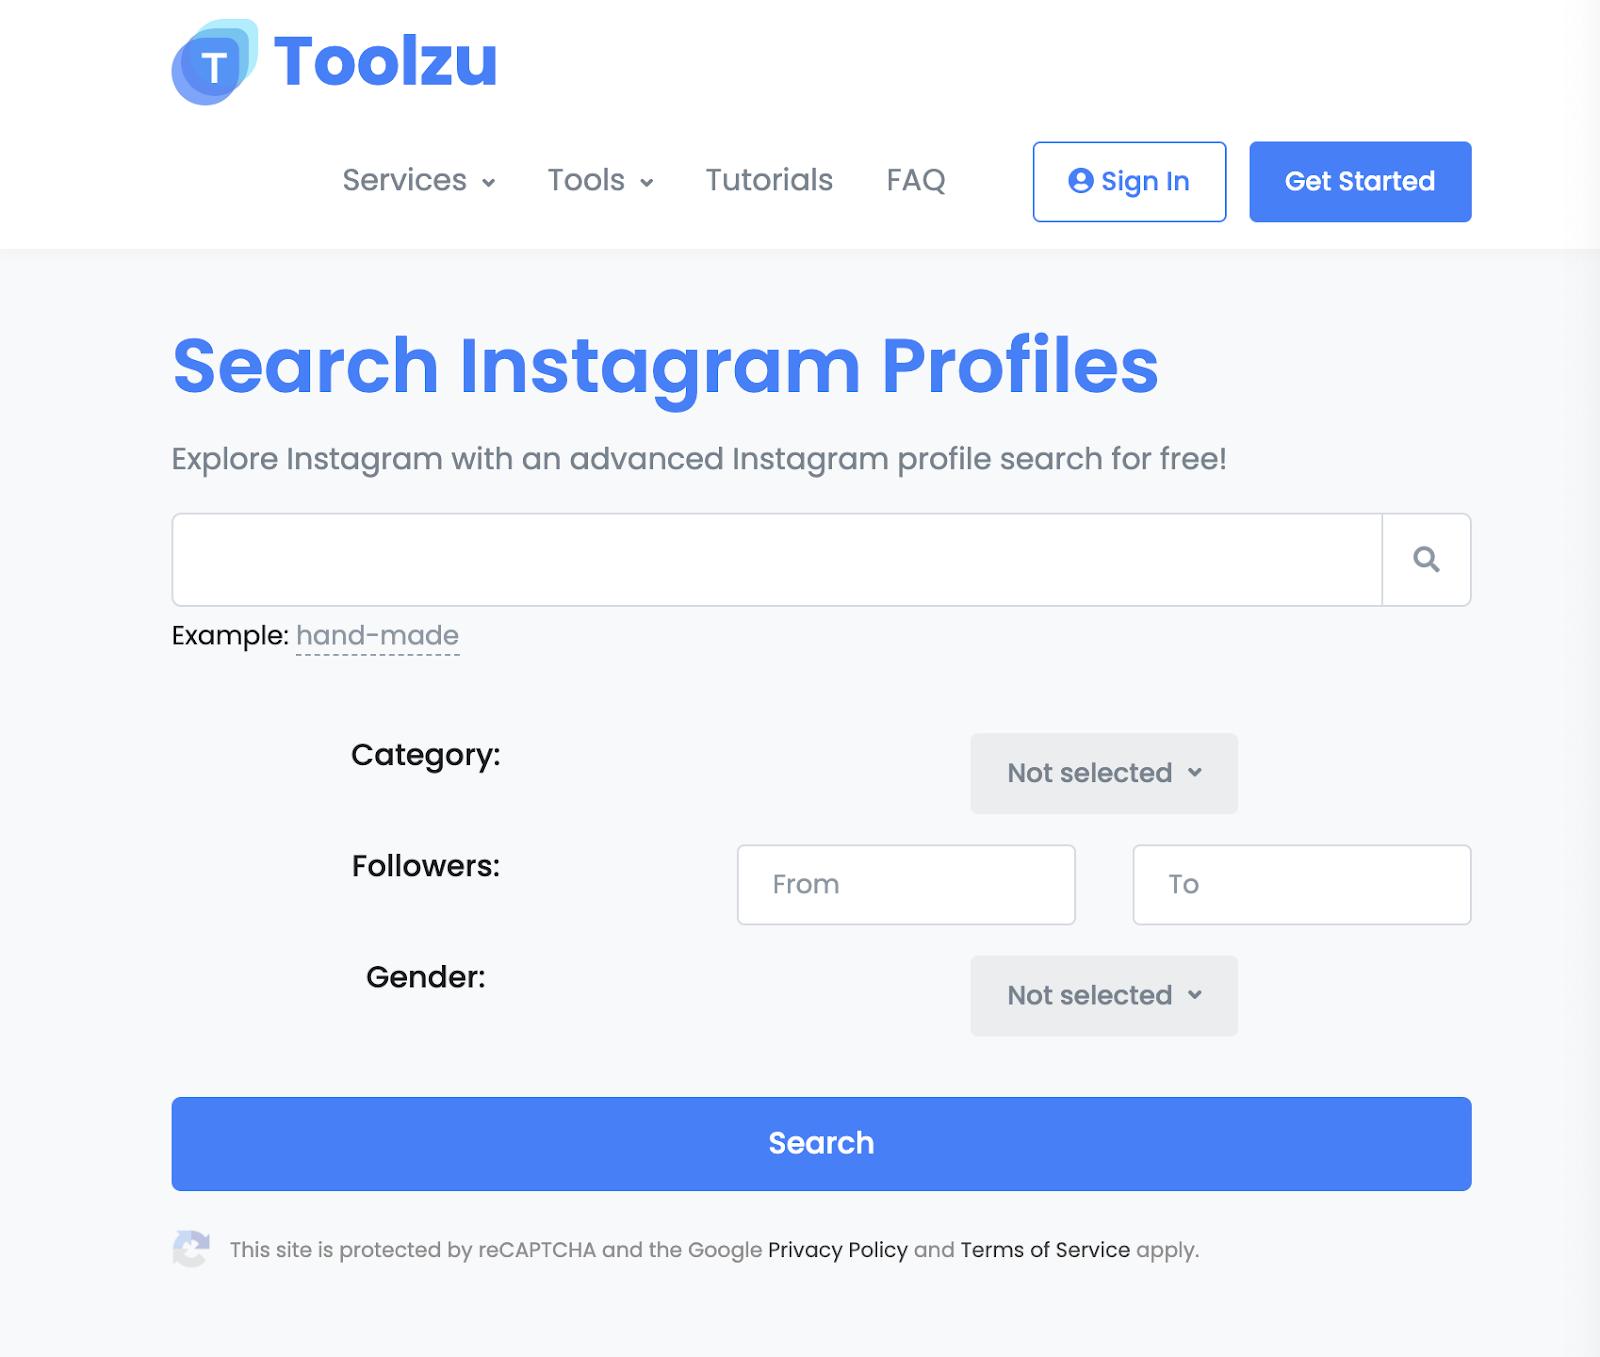 toolzu instagram profile search photo